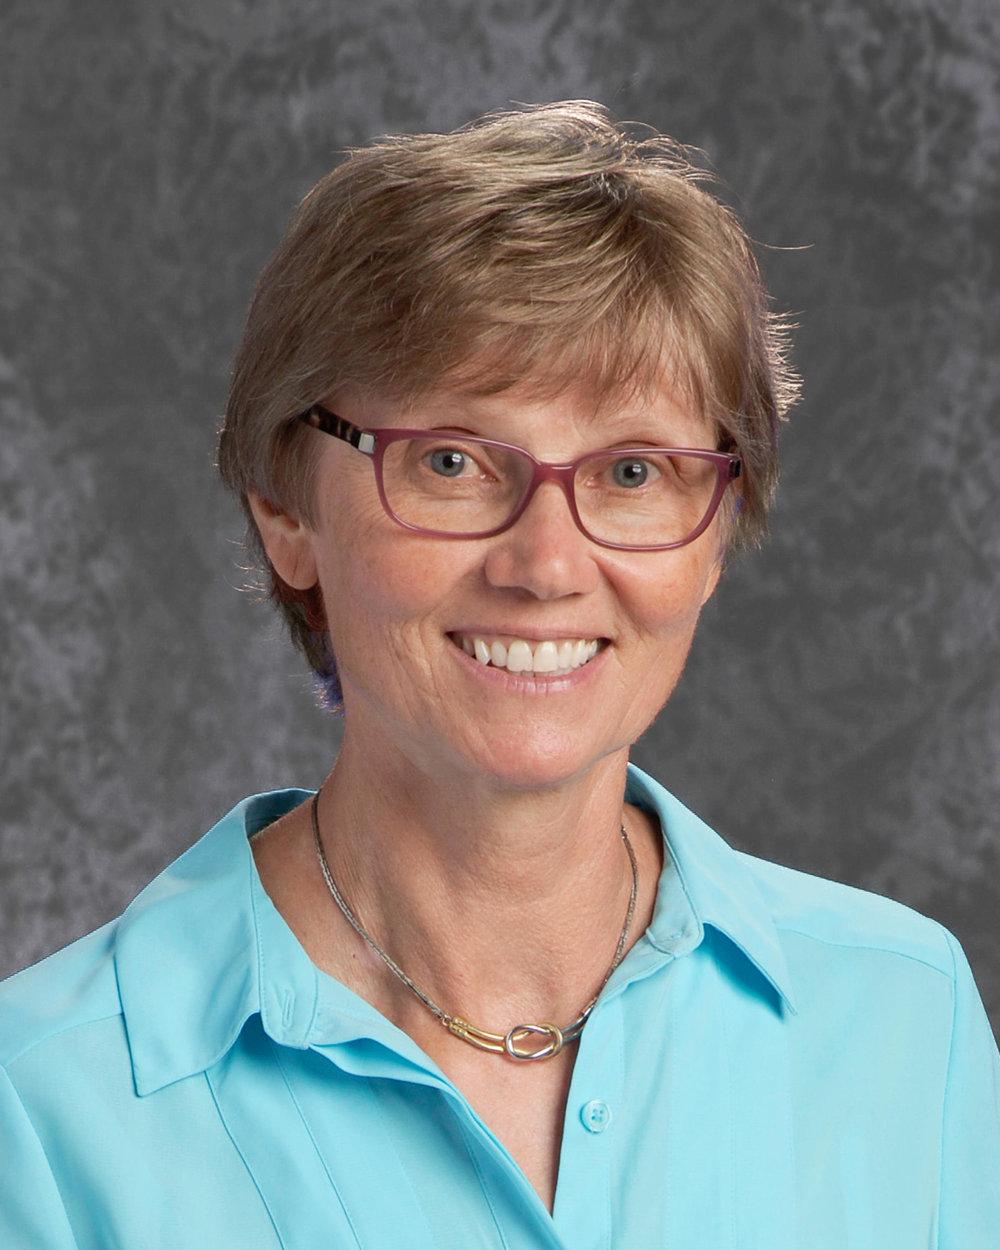 Ruth Seggerson